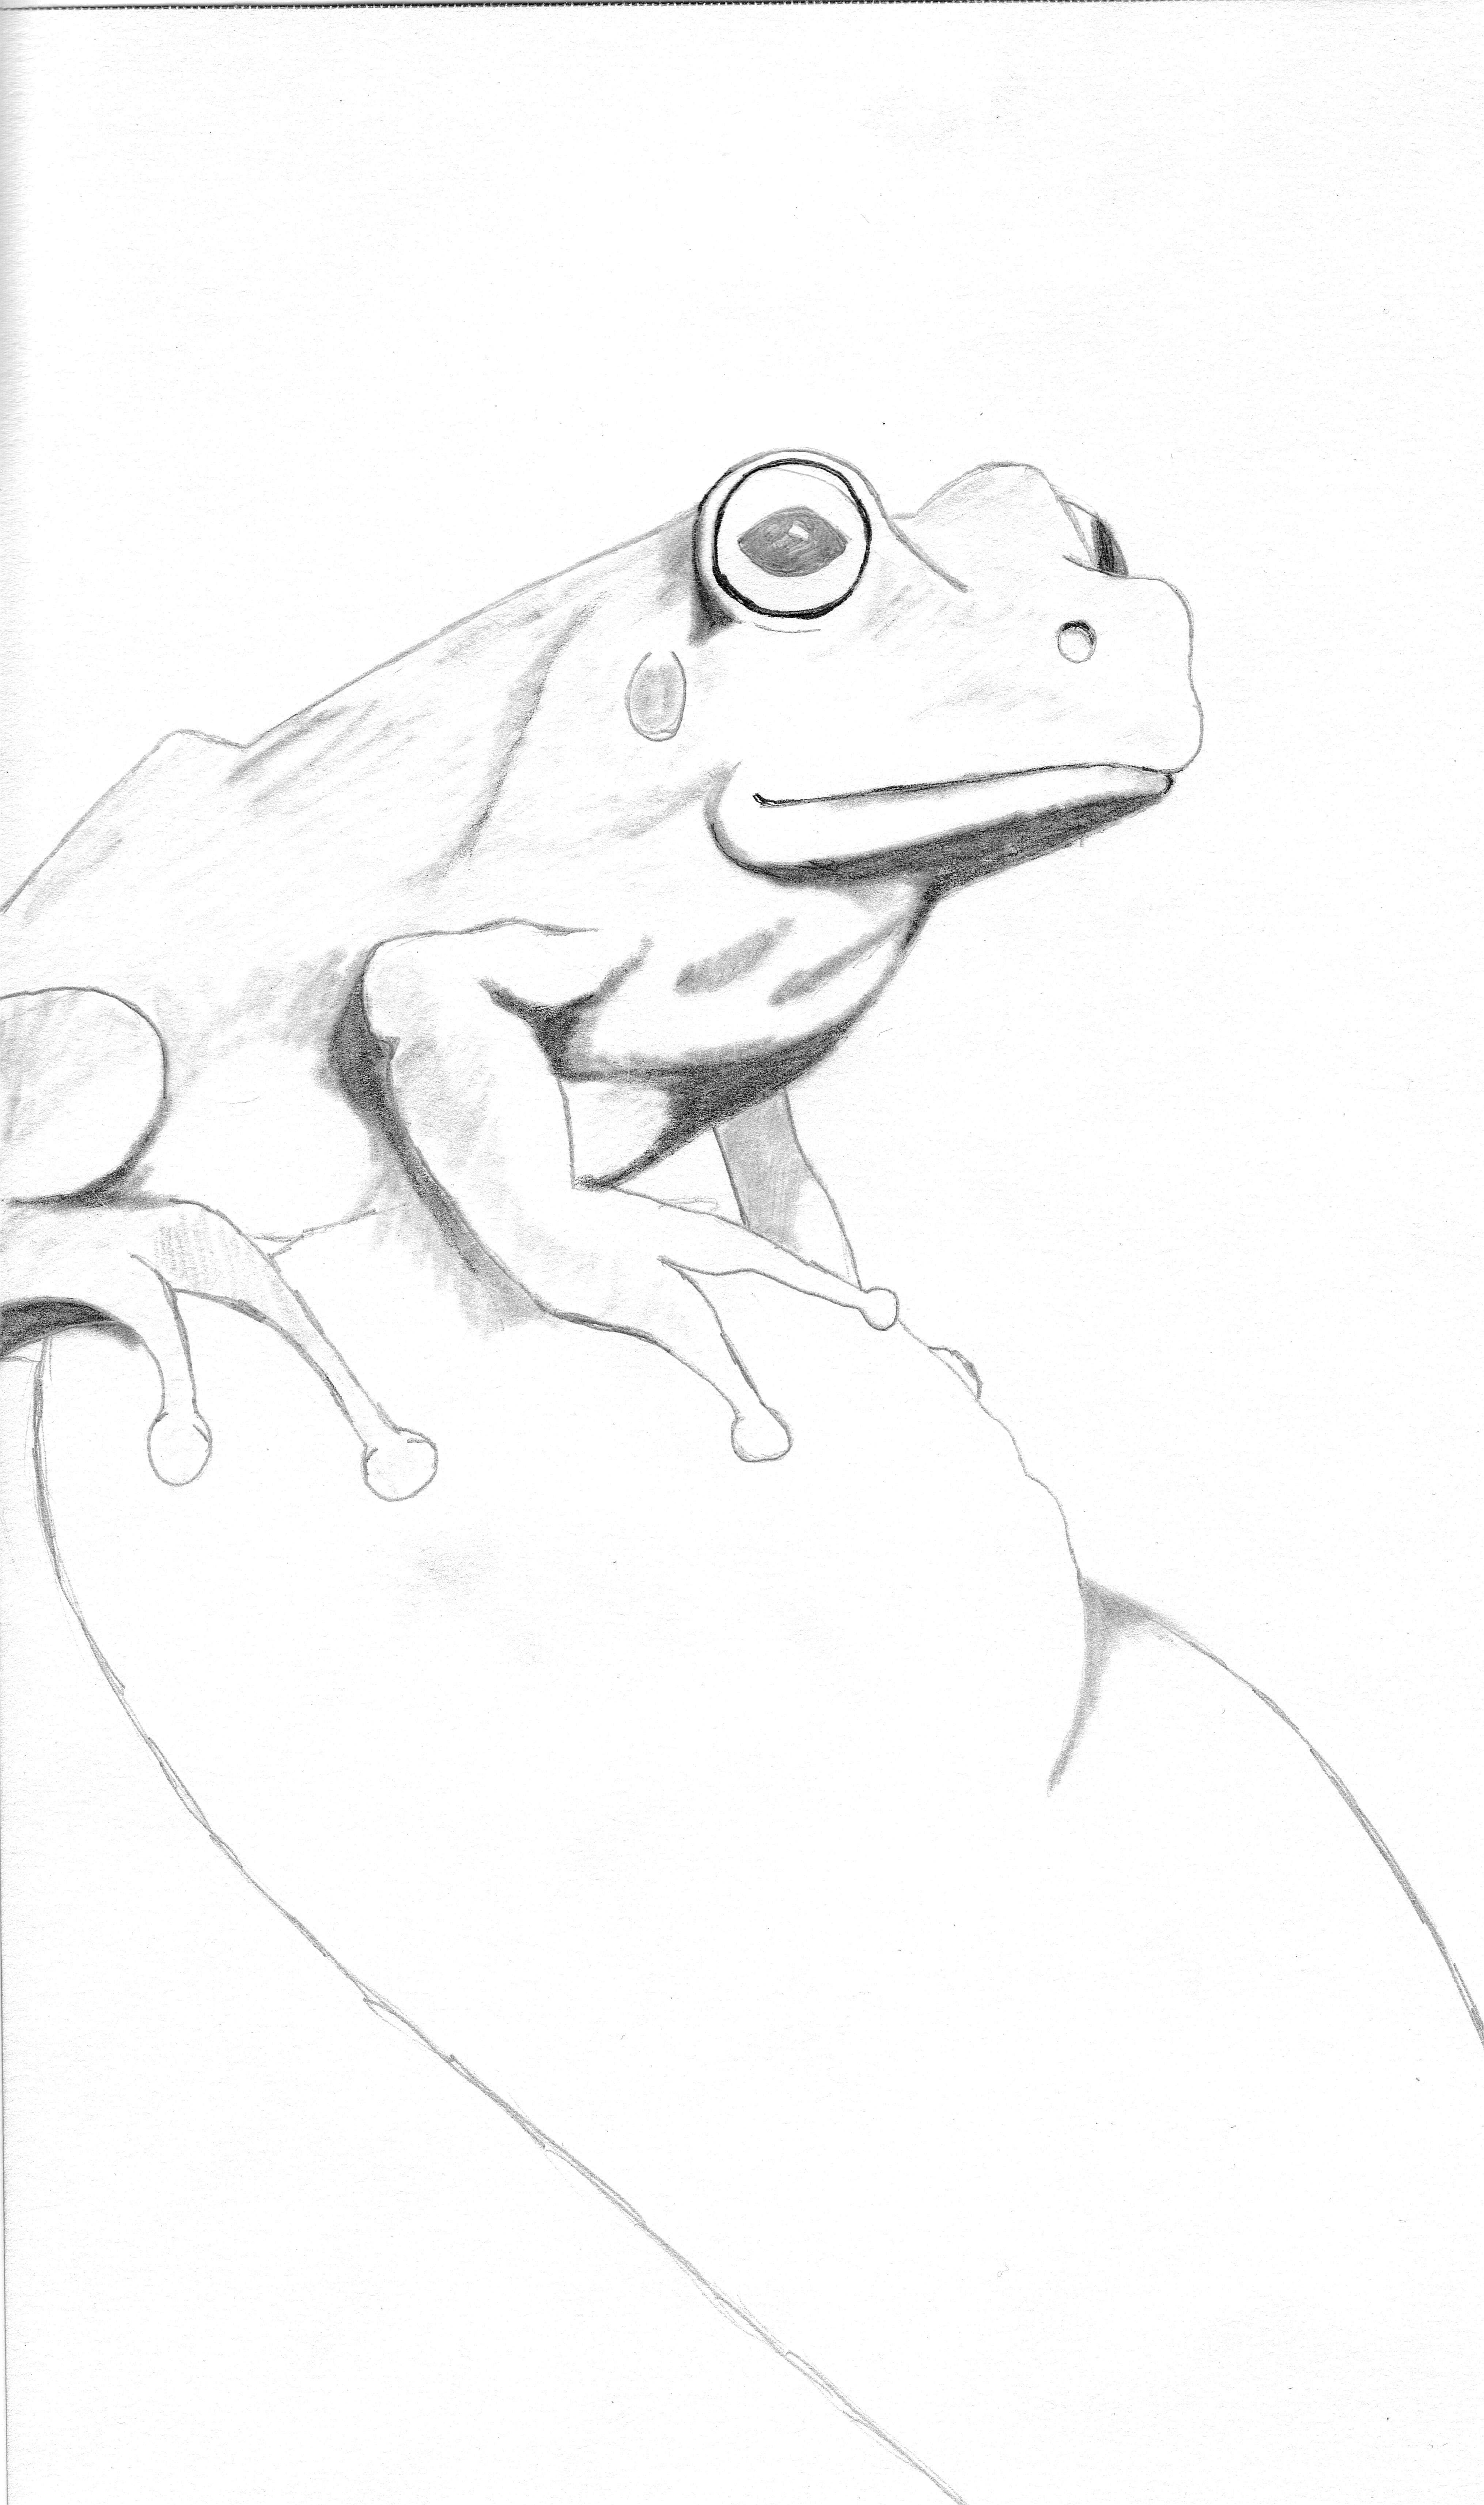 4060x6851 Frog Pencil Drawing By Liquidsnake2021